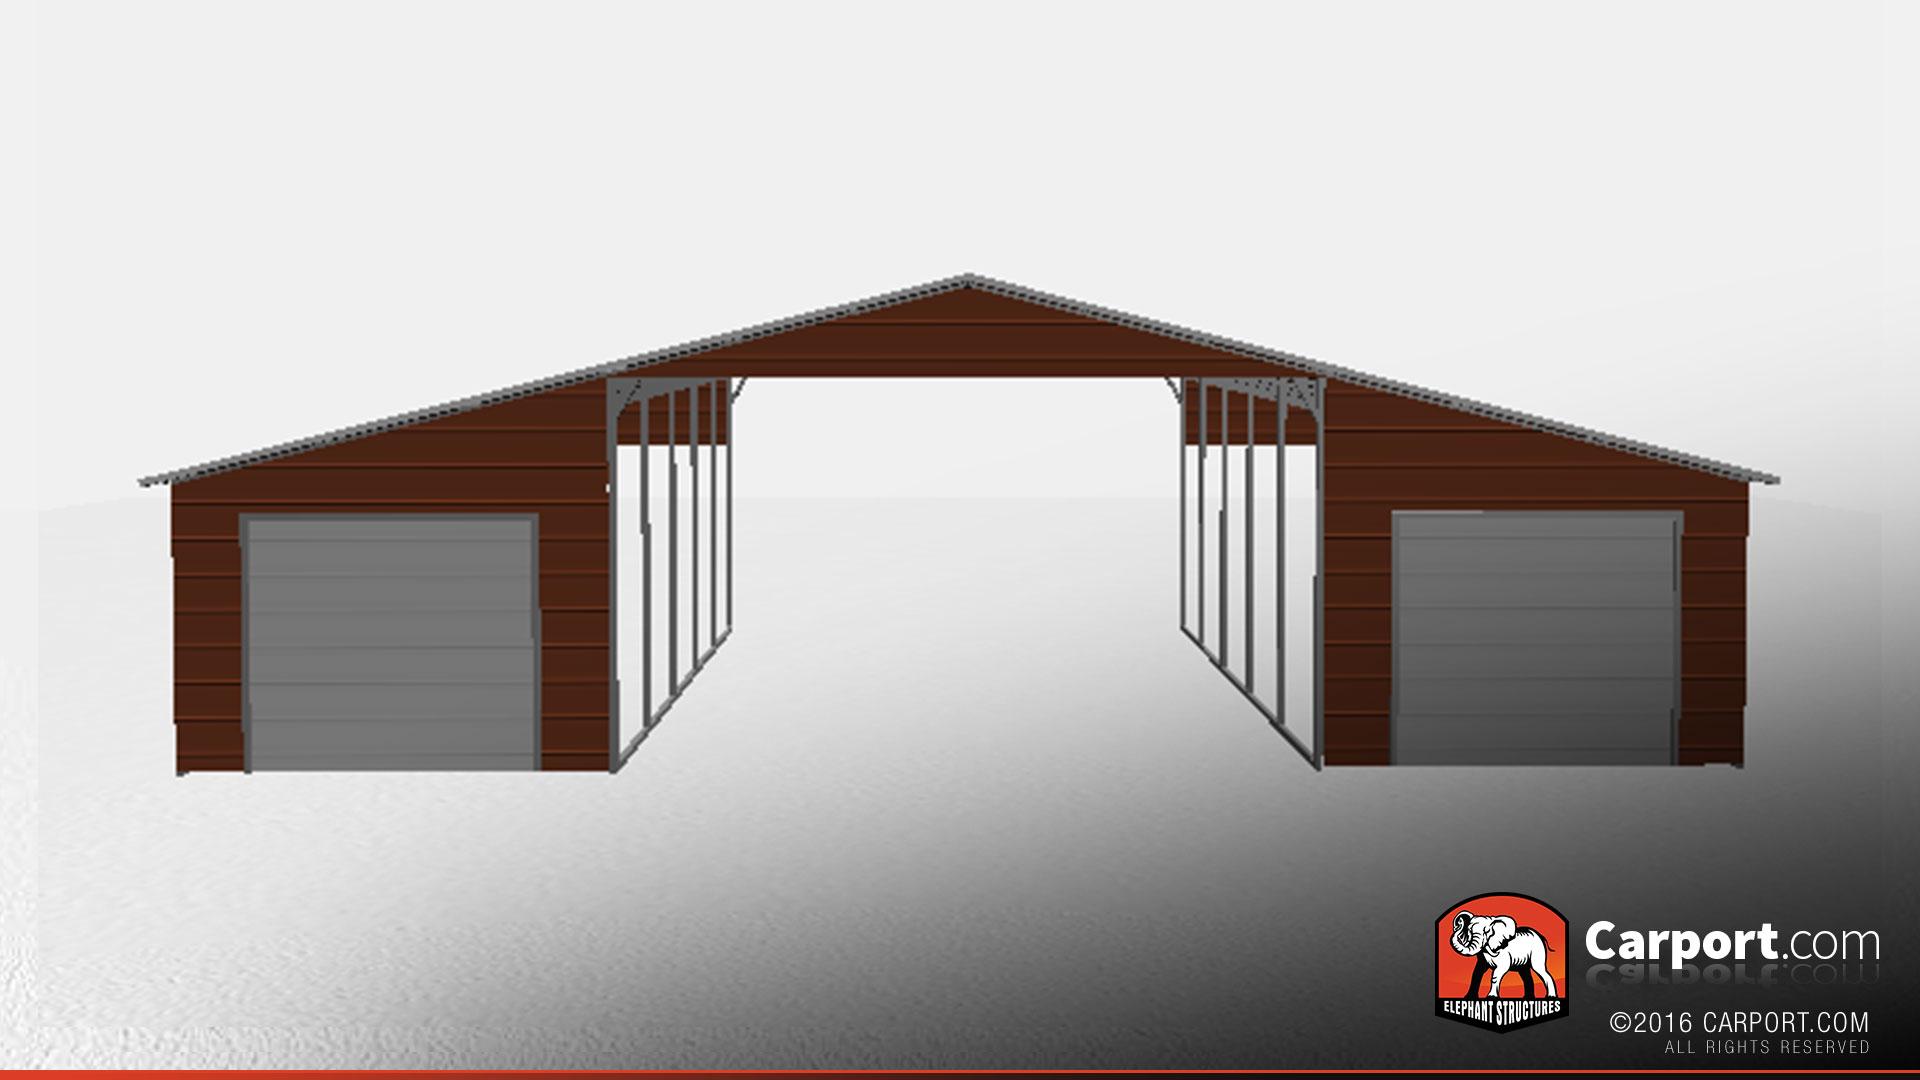 42 x 21 x 12 valley style metal barn shop metal buildings online valley style metal barn